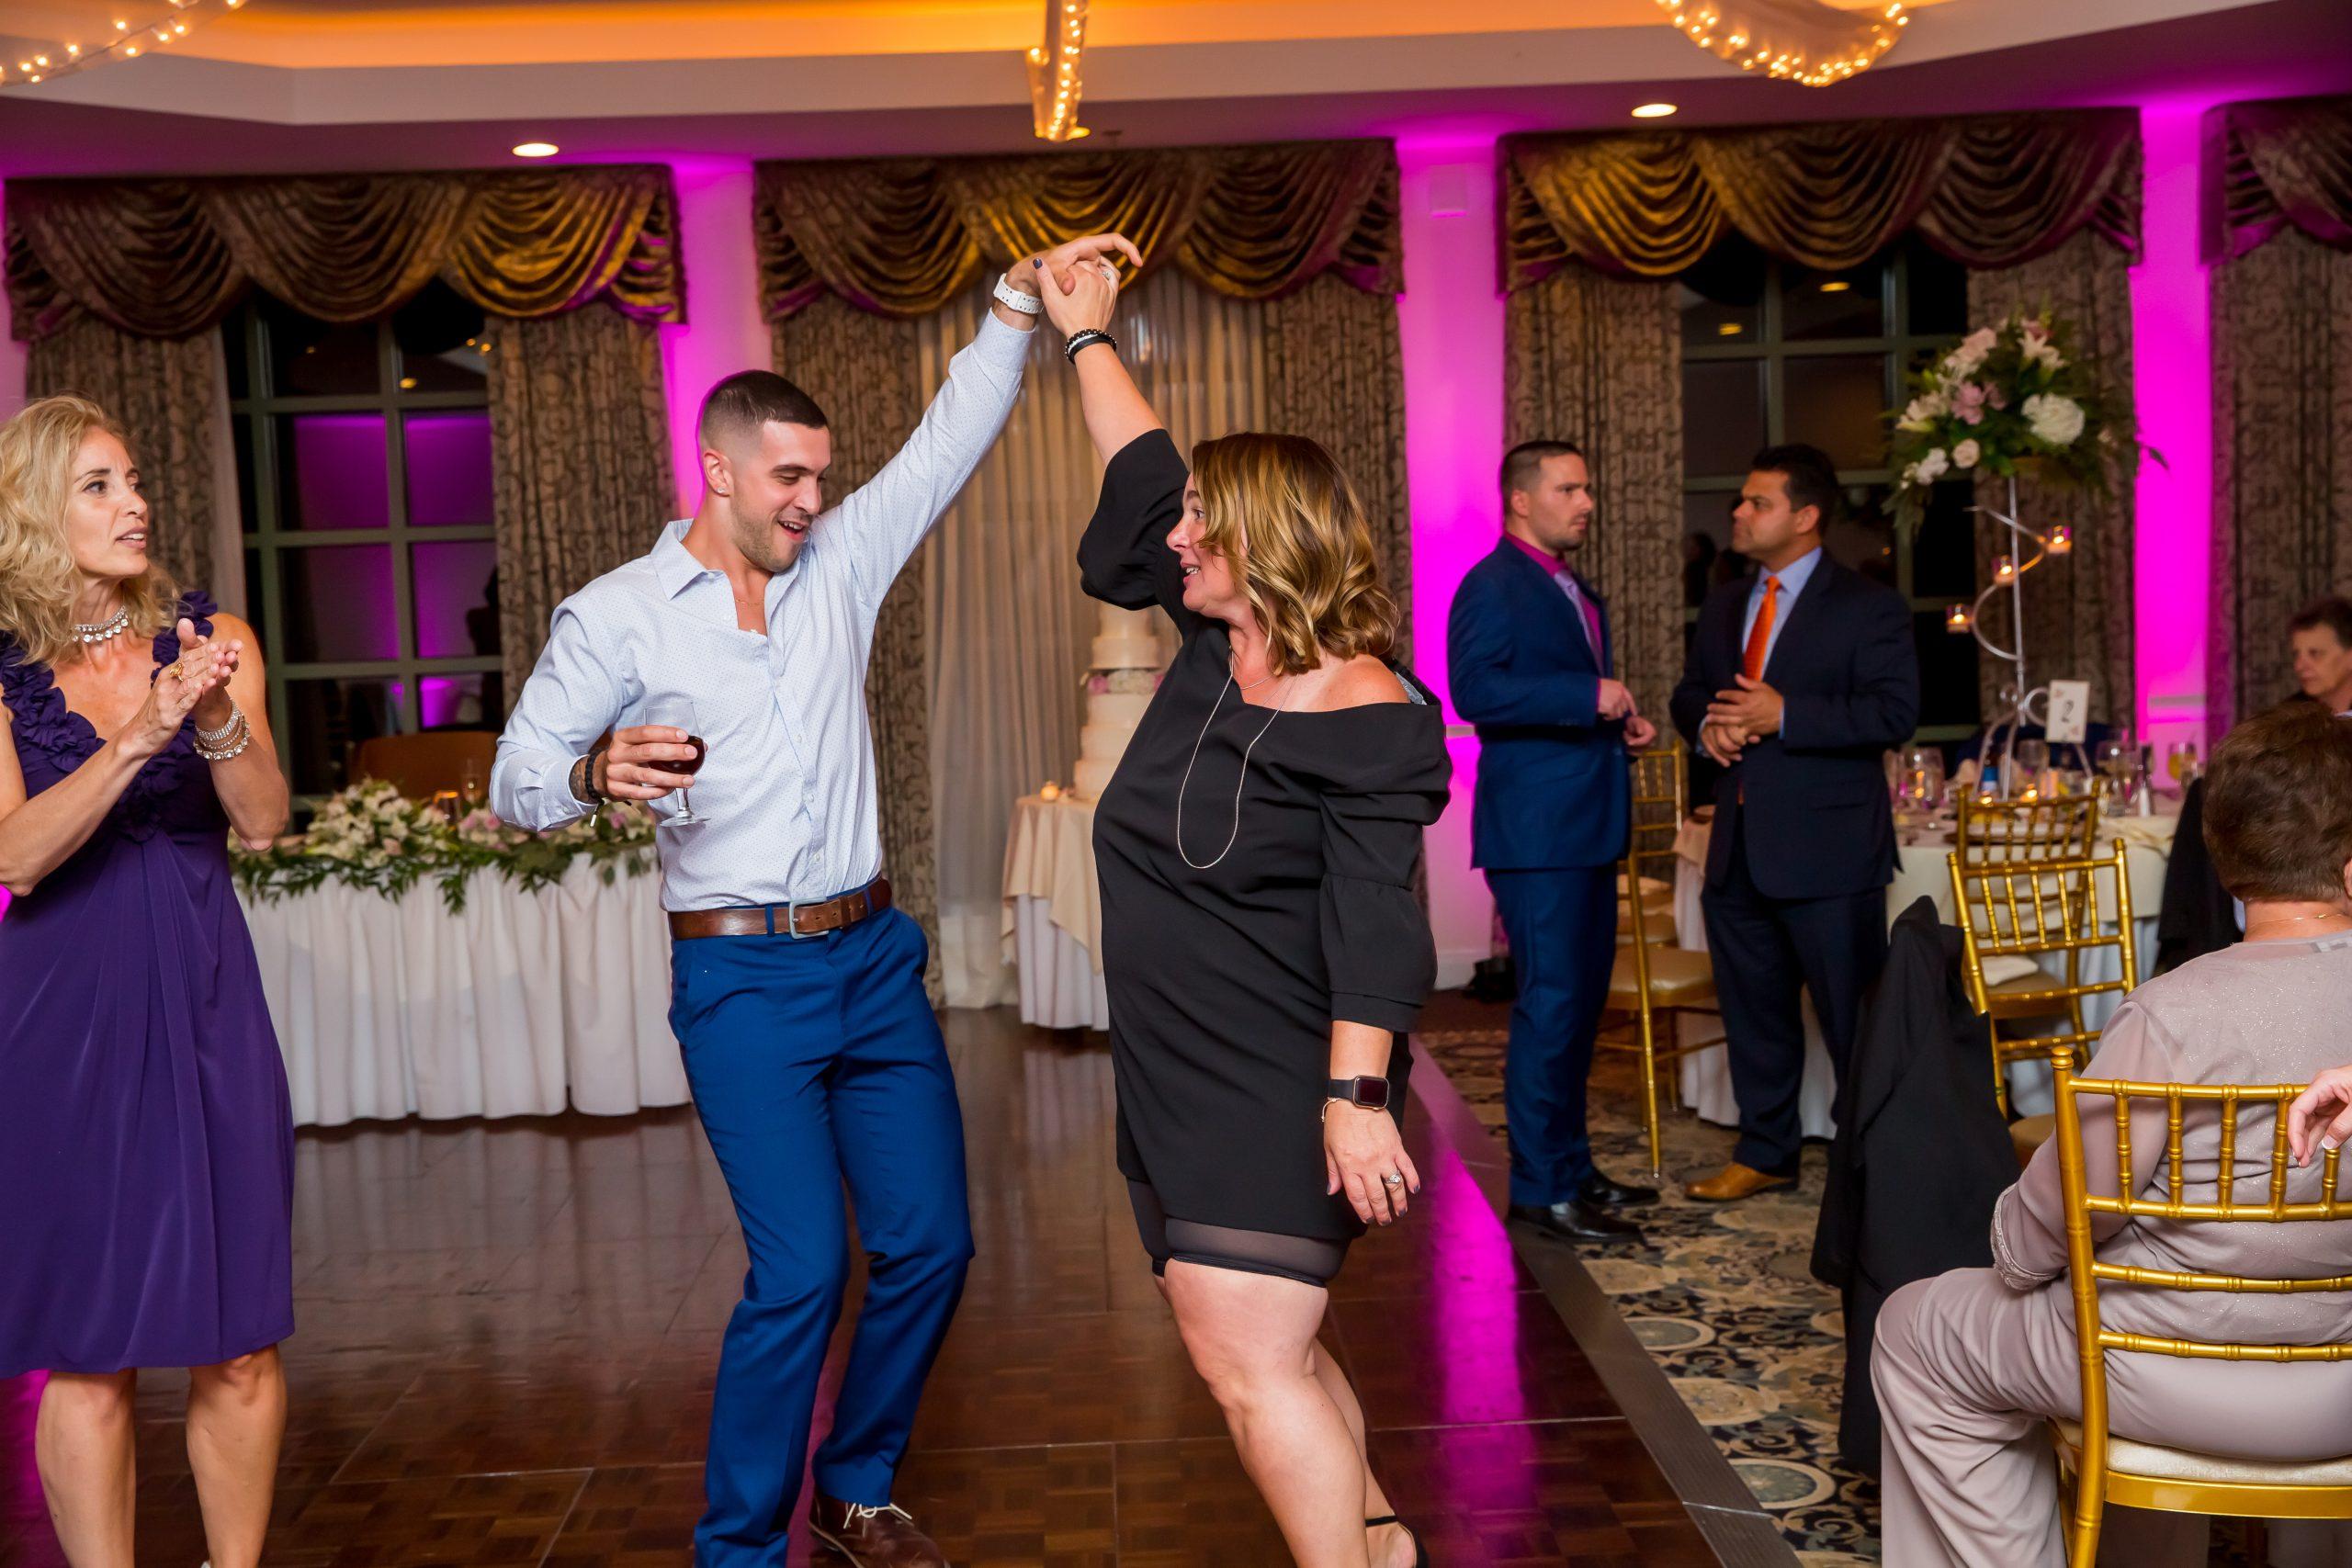 Victori_Rob_Mohawk River Country Club Wedding-57.jpg